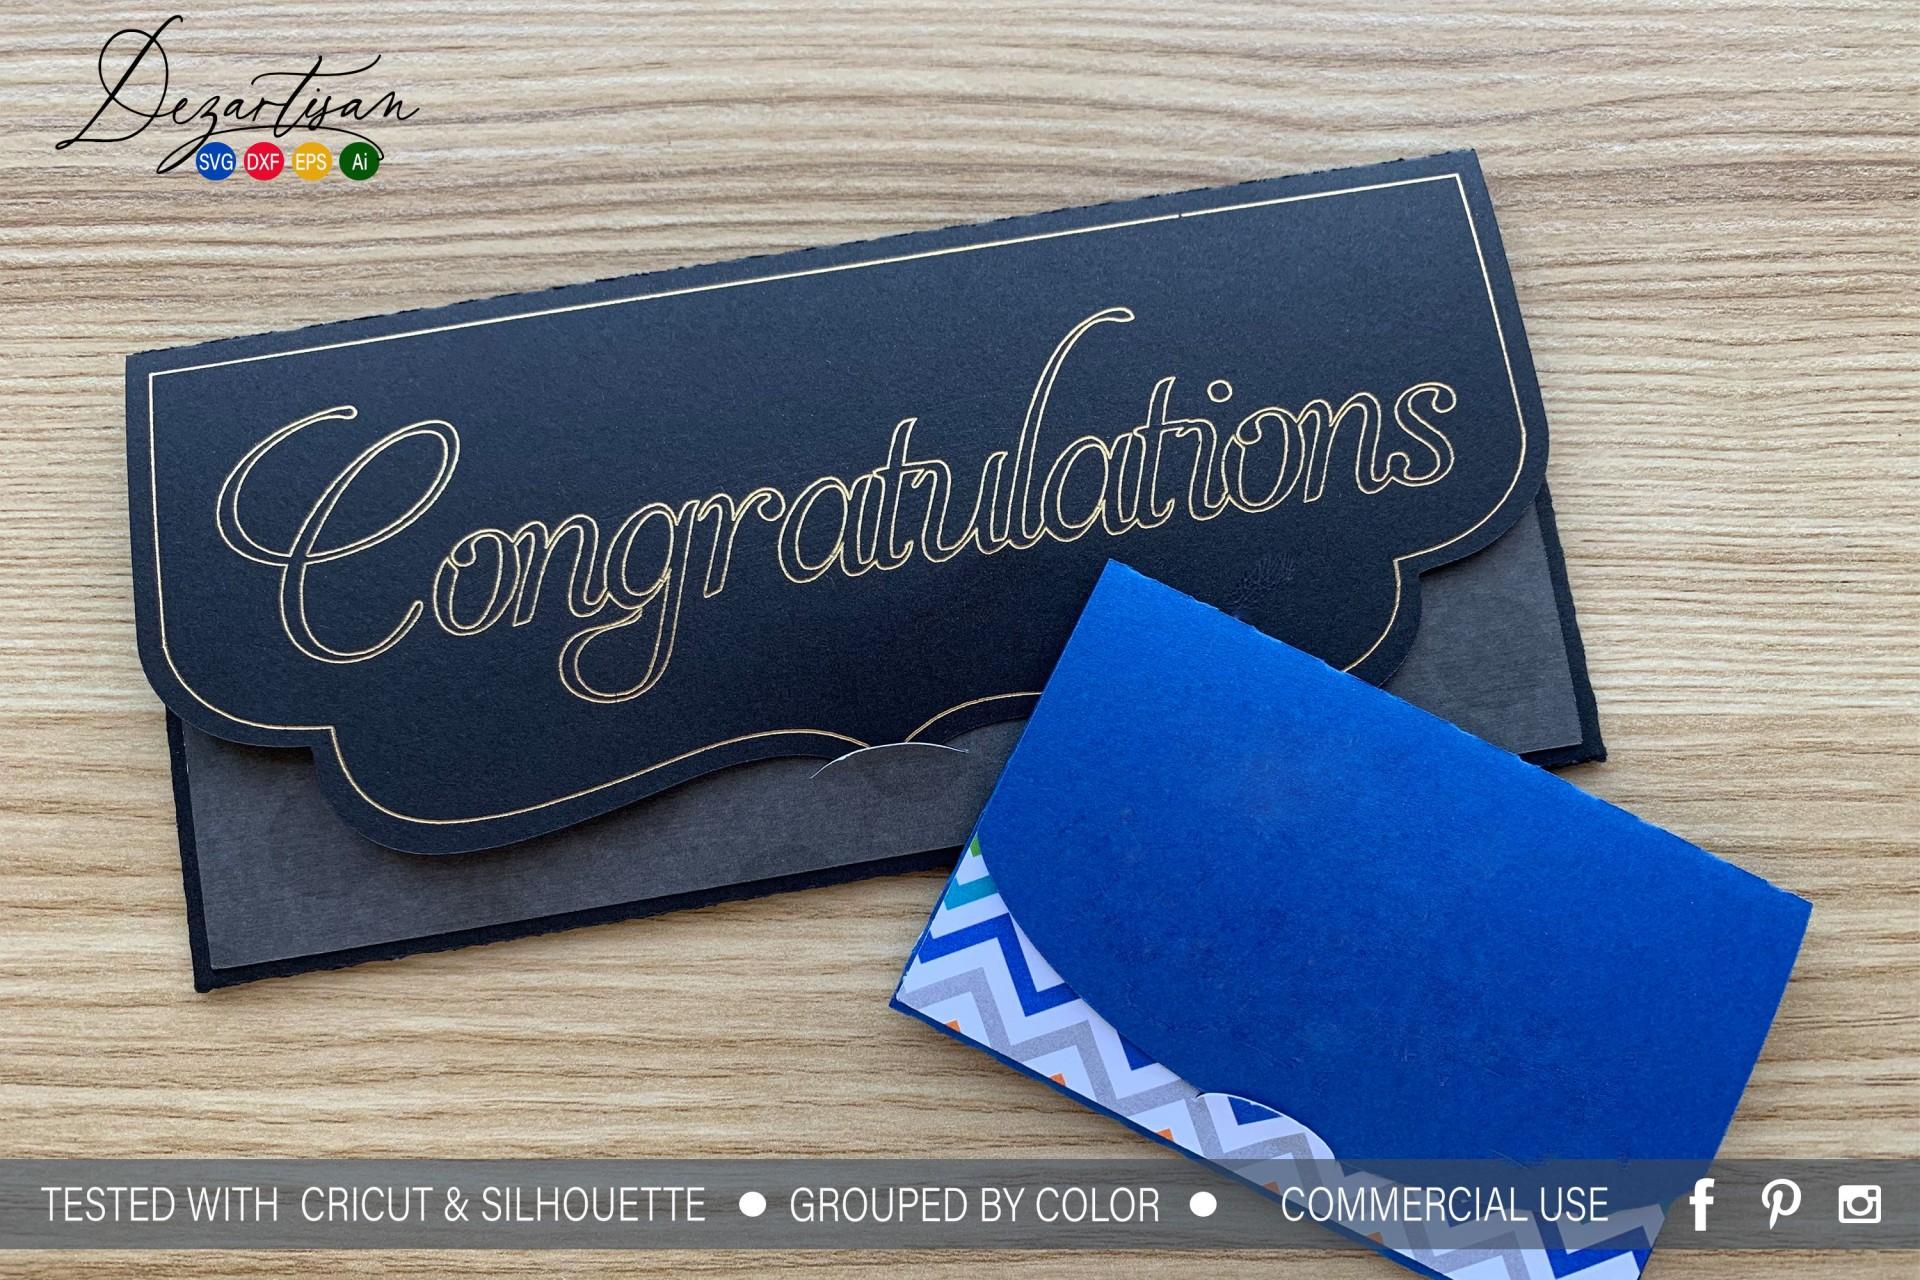 007 Shocking Gift Card Envelope Template Image  Templates Voucher Diy Free Printable1920